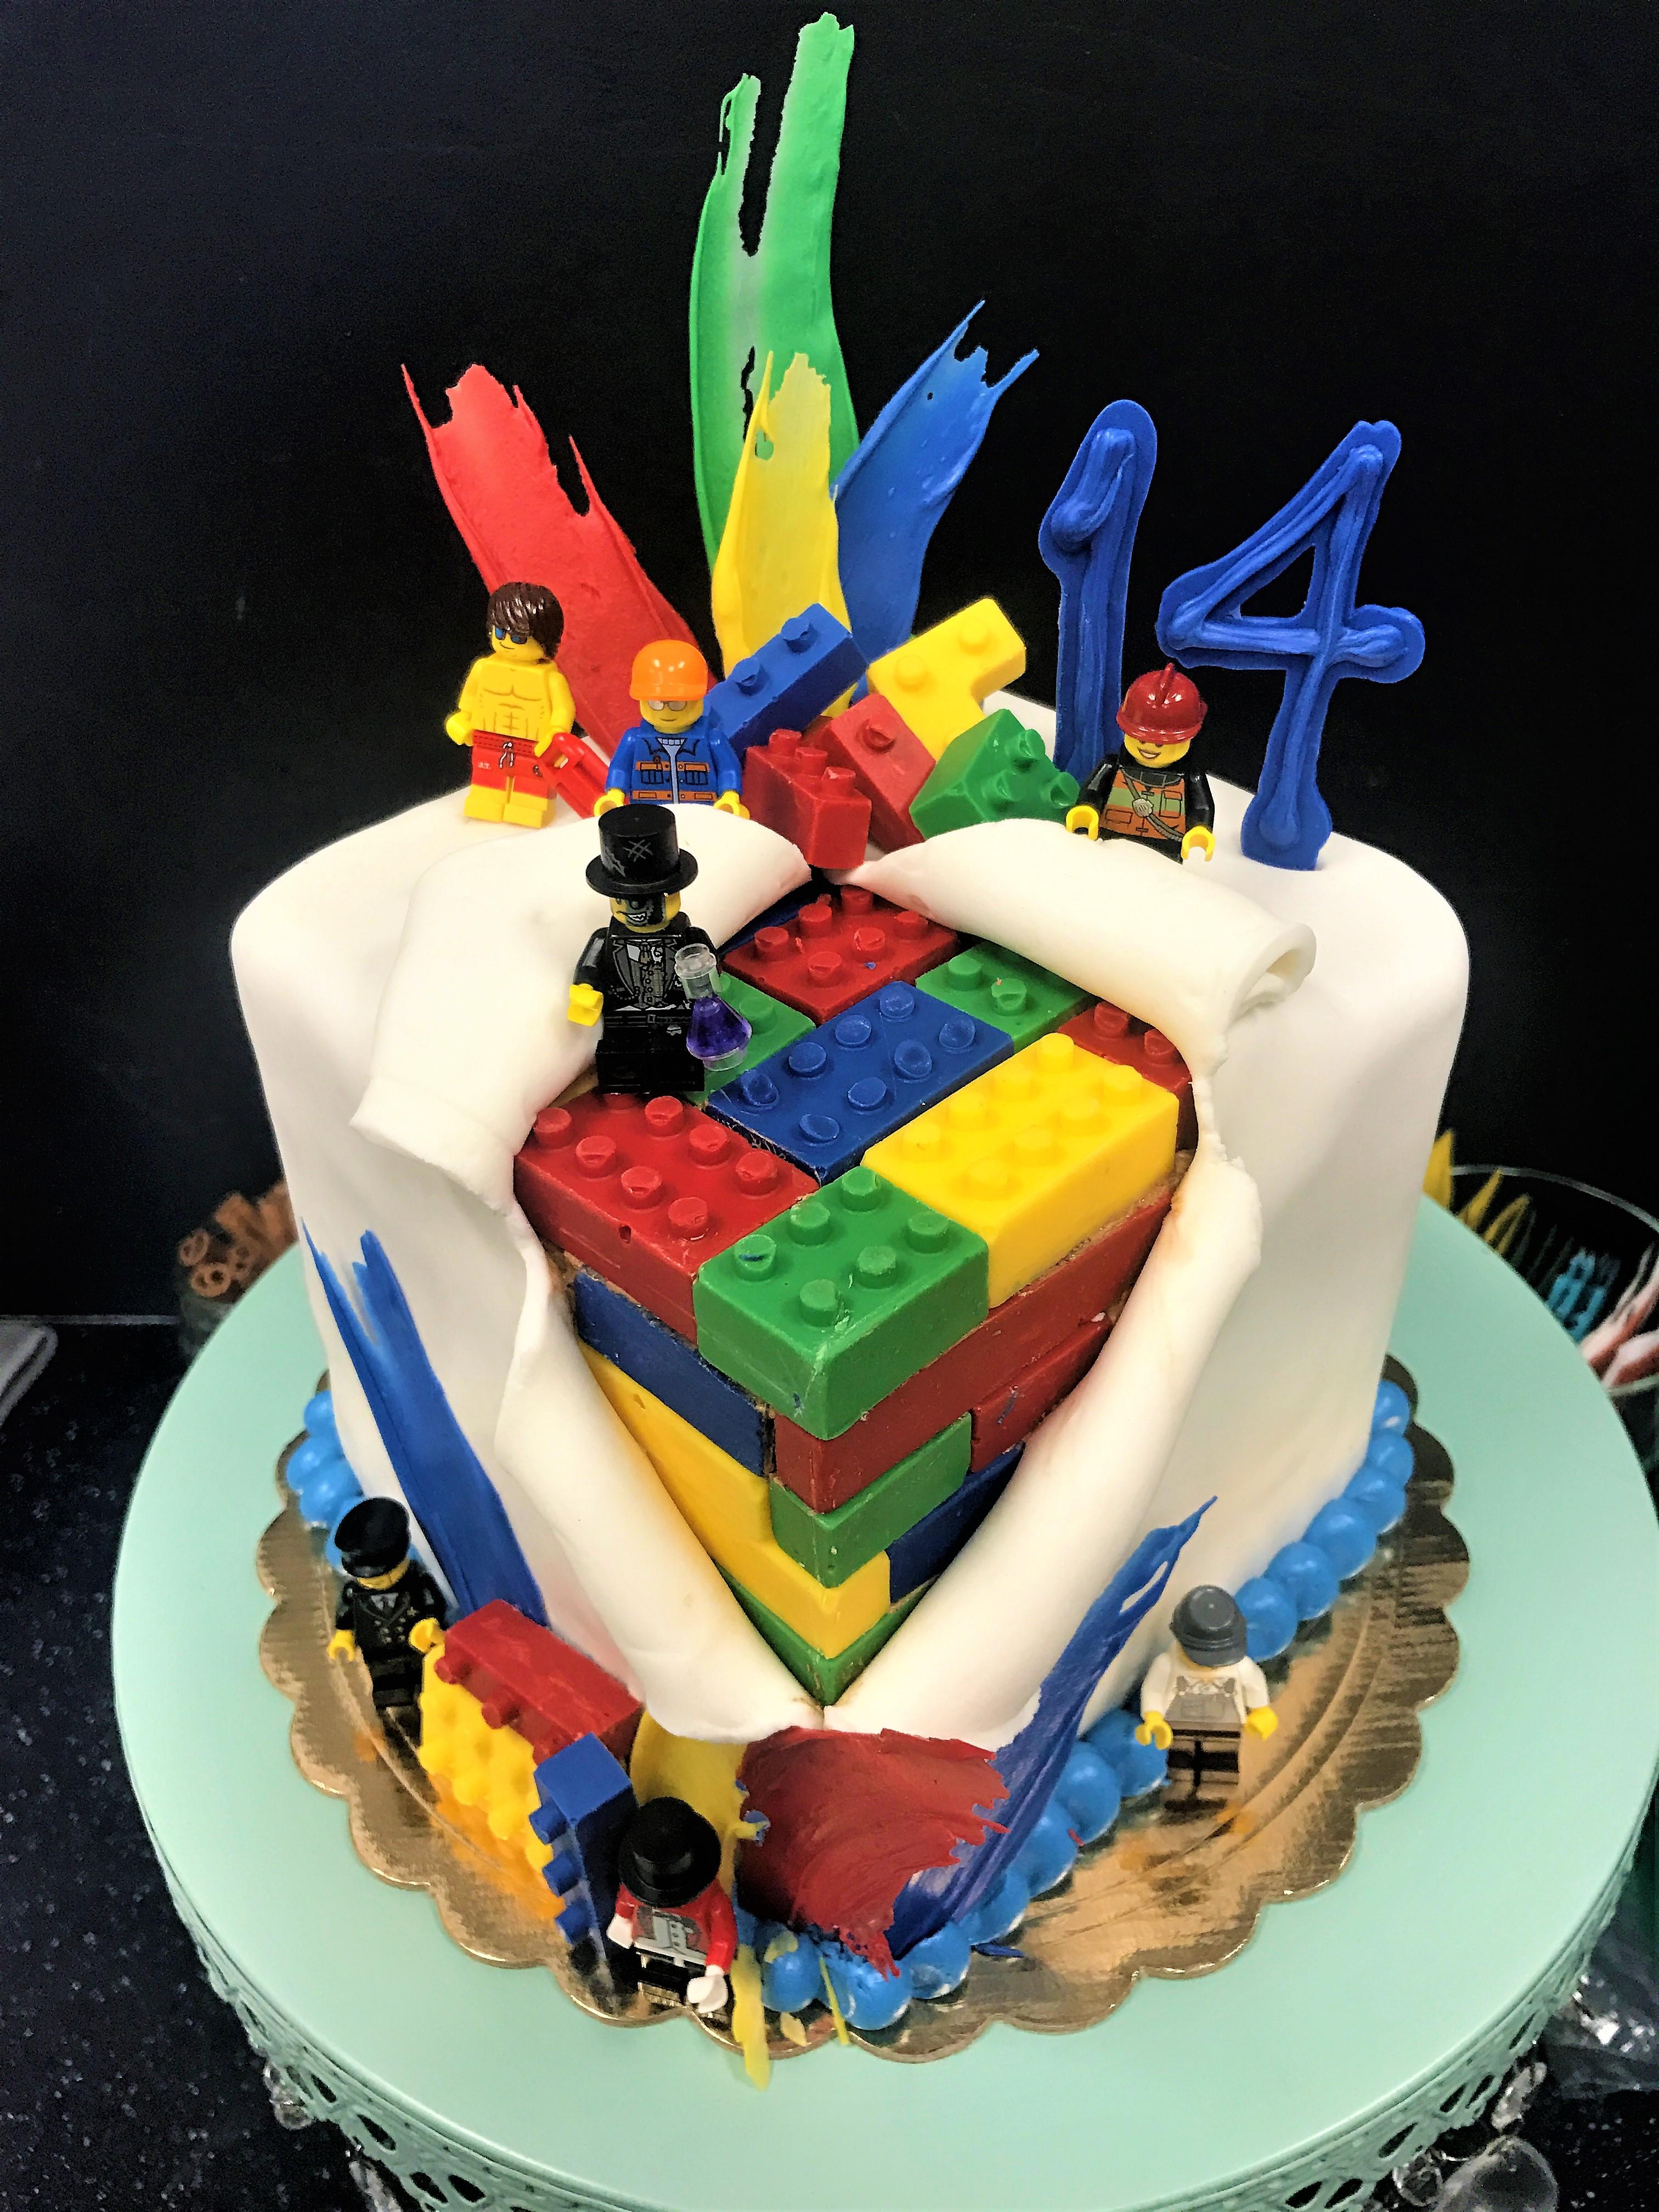 6'' square lego cake